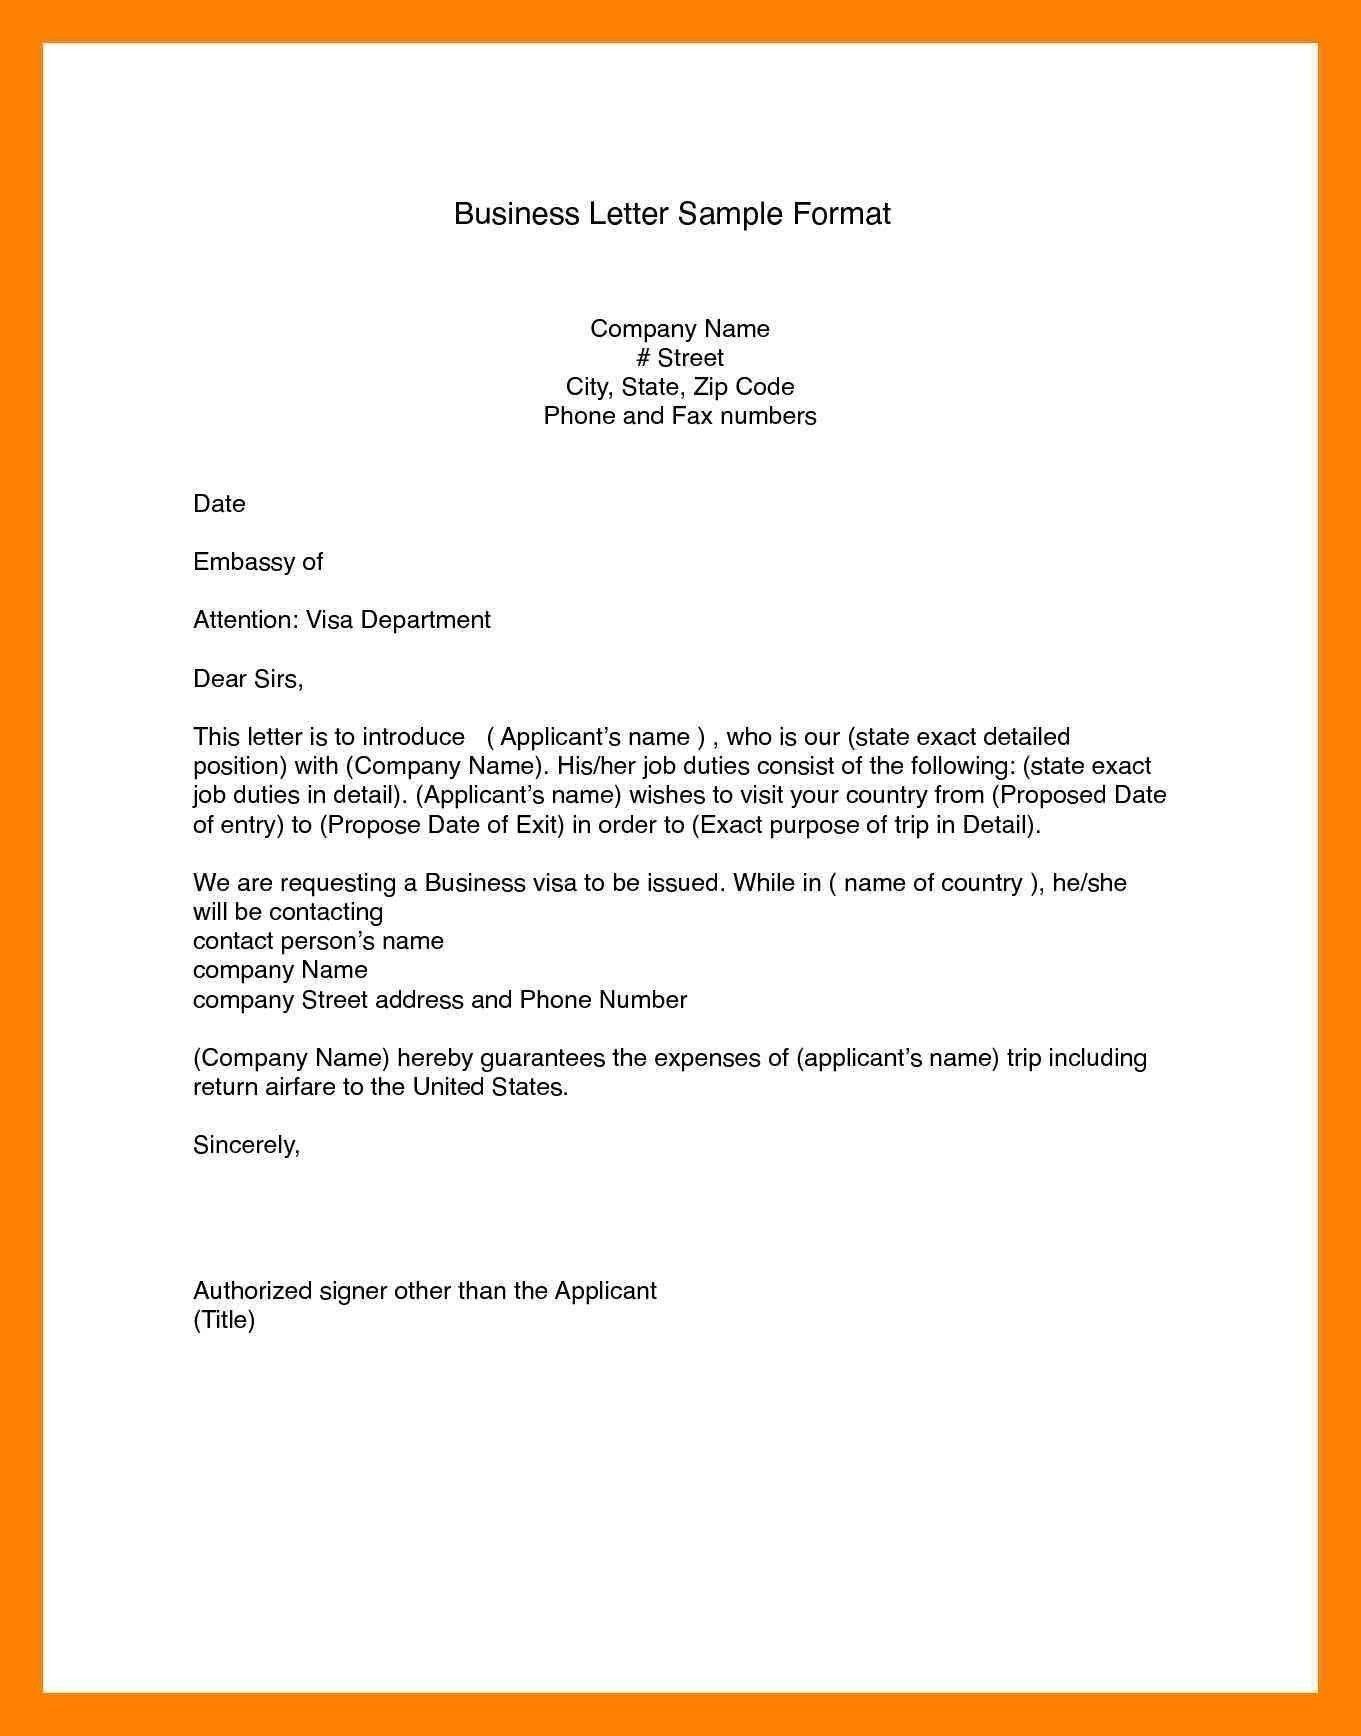 New Business Letter format for 6th Grade Business letter